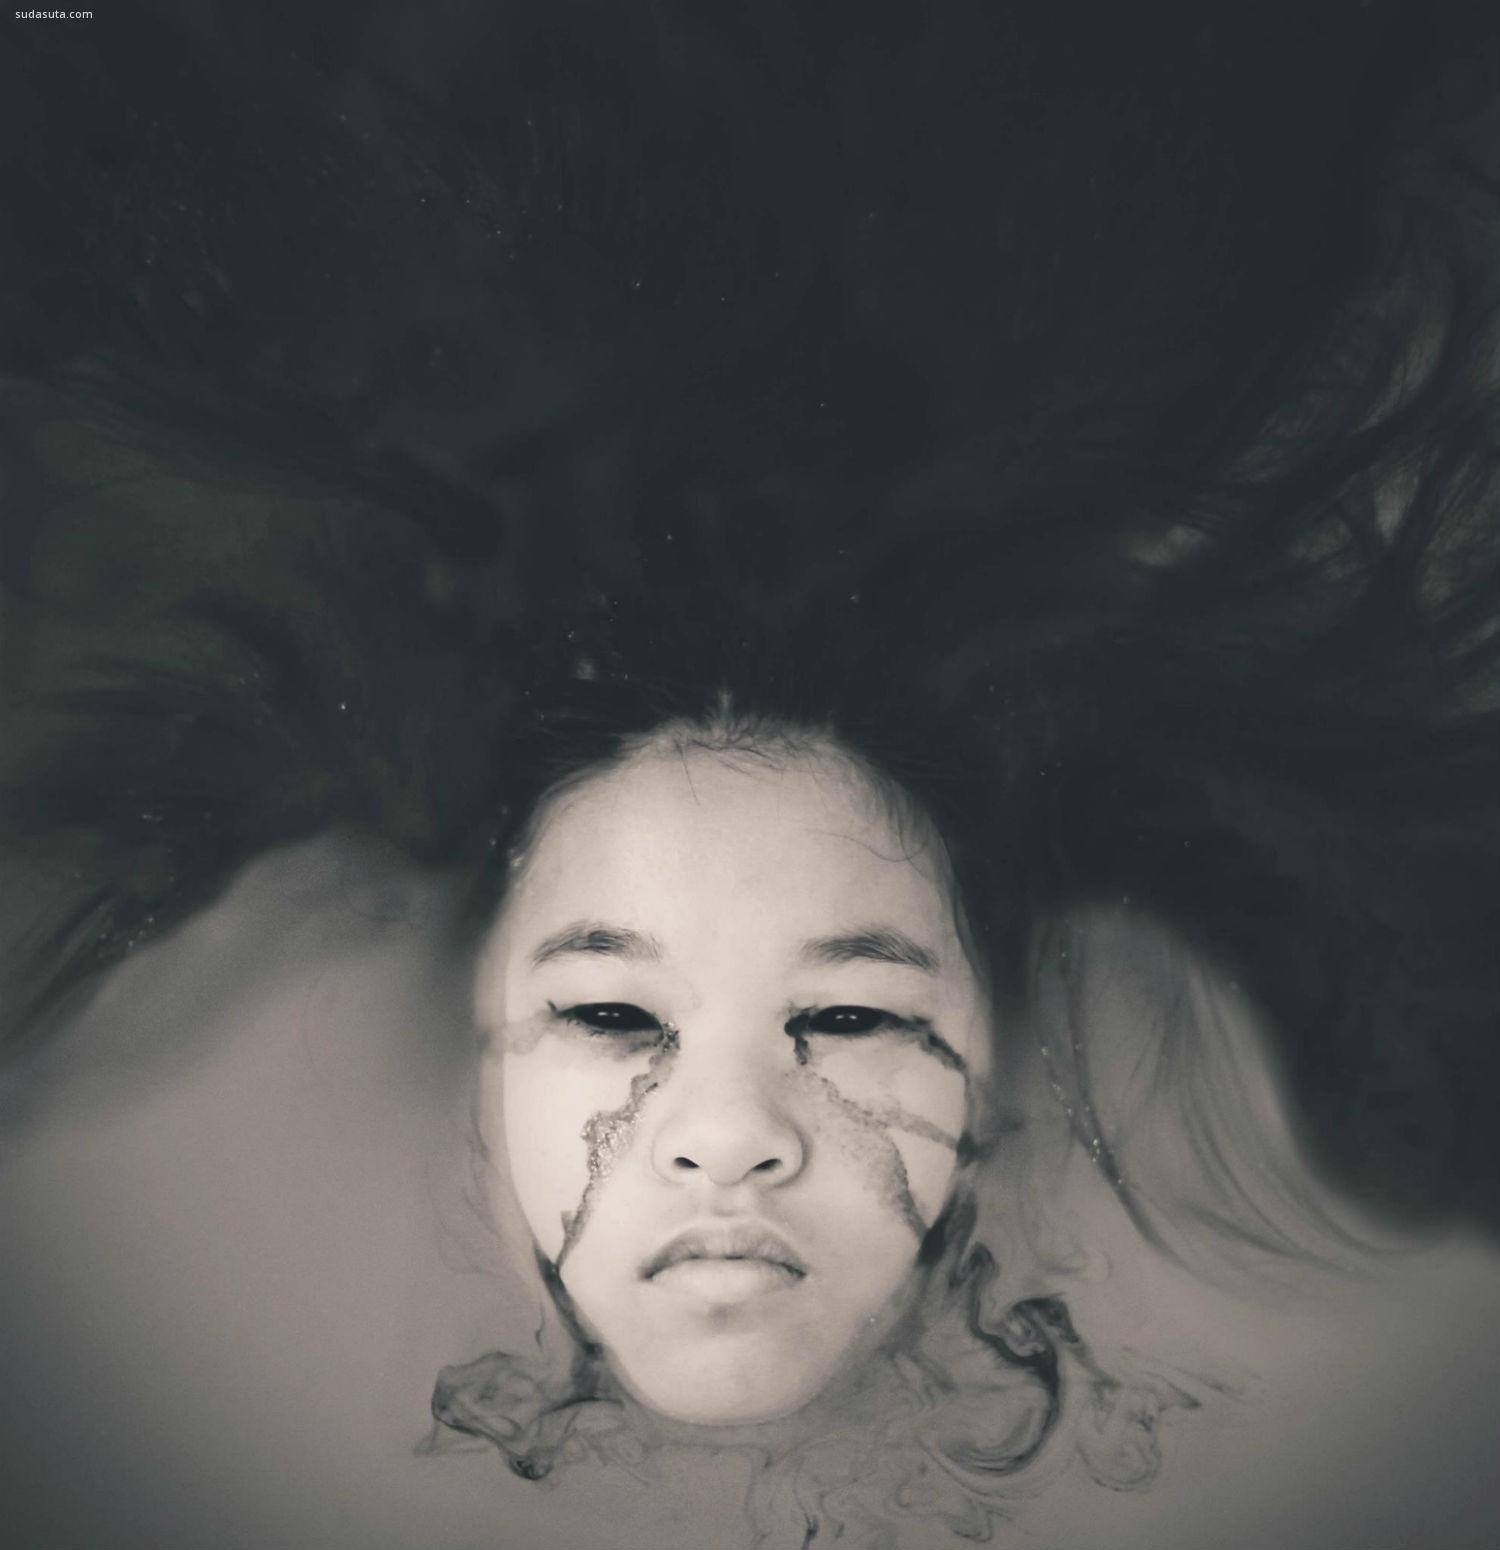 Brendon Burton 超现实主义摄影作品欣赏